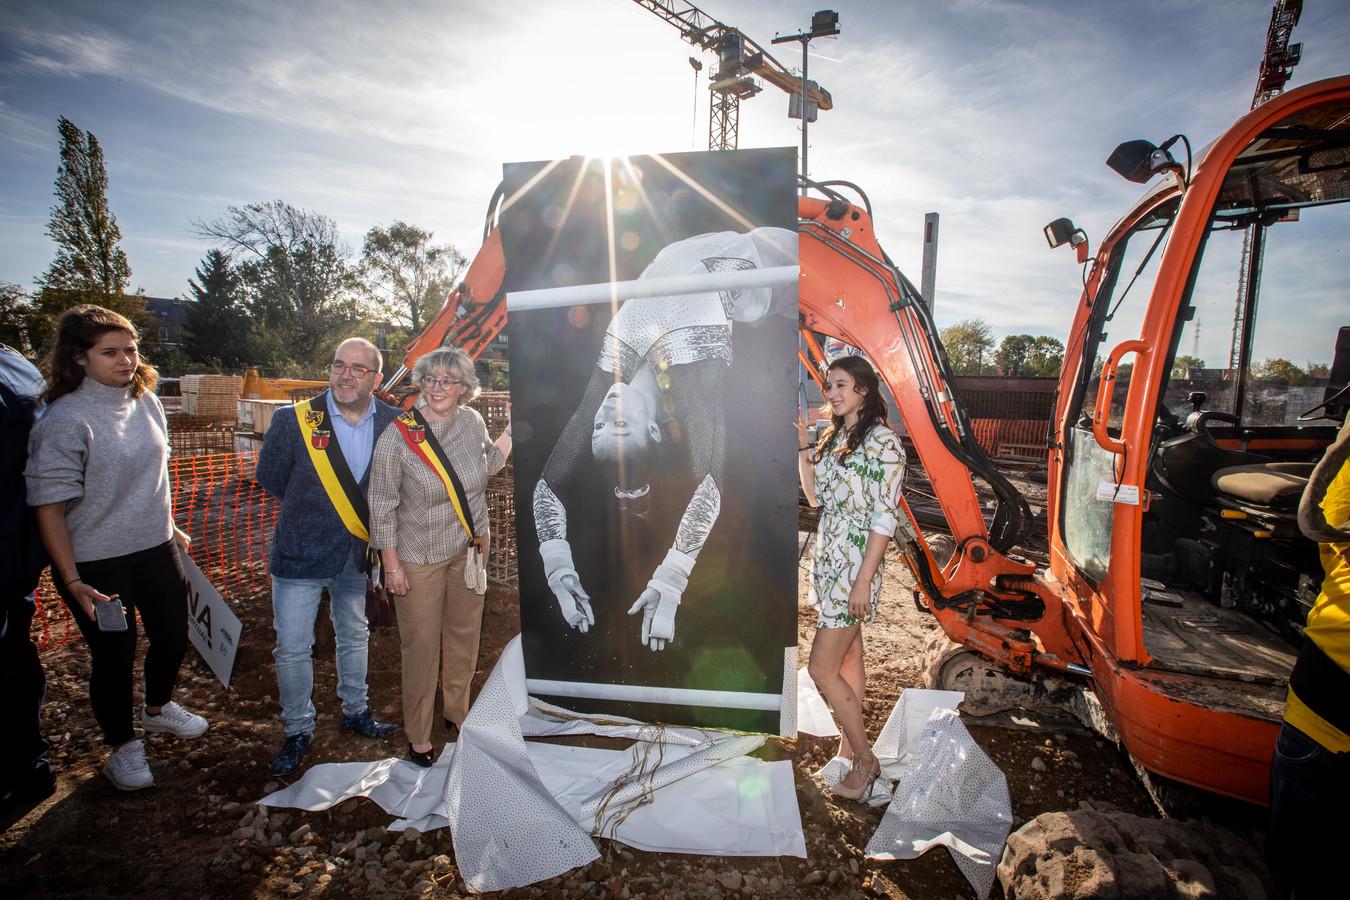 Huldiging Nina Derwael in Sint-Truiden